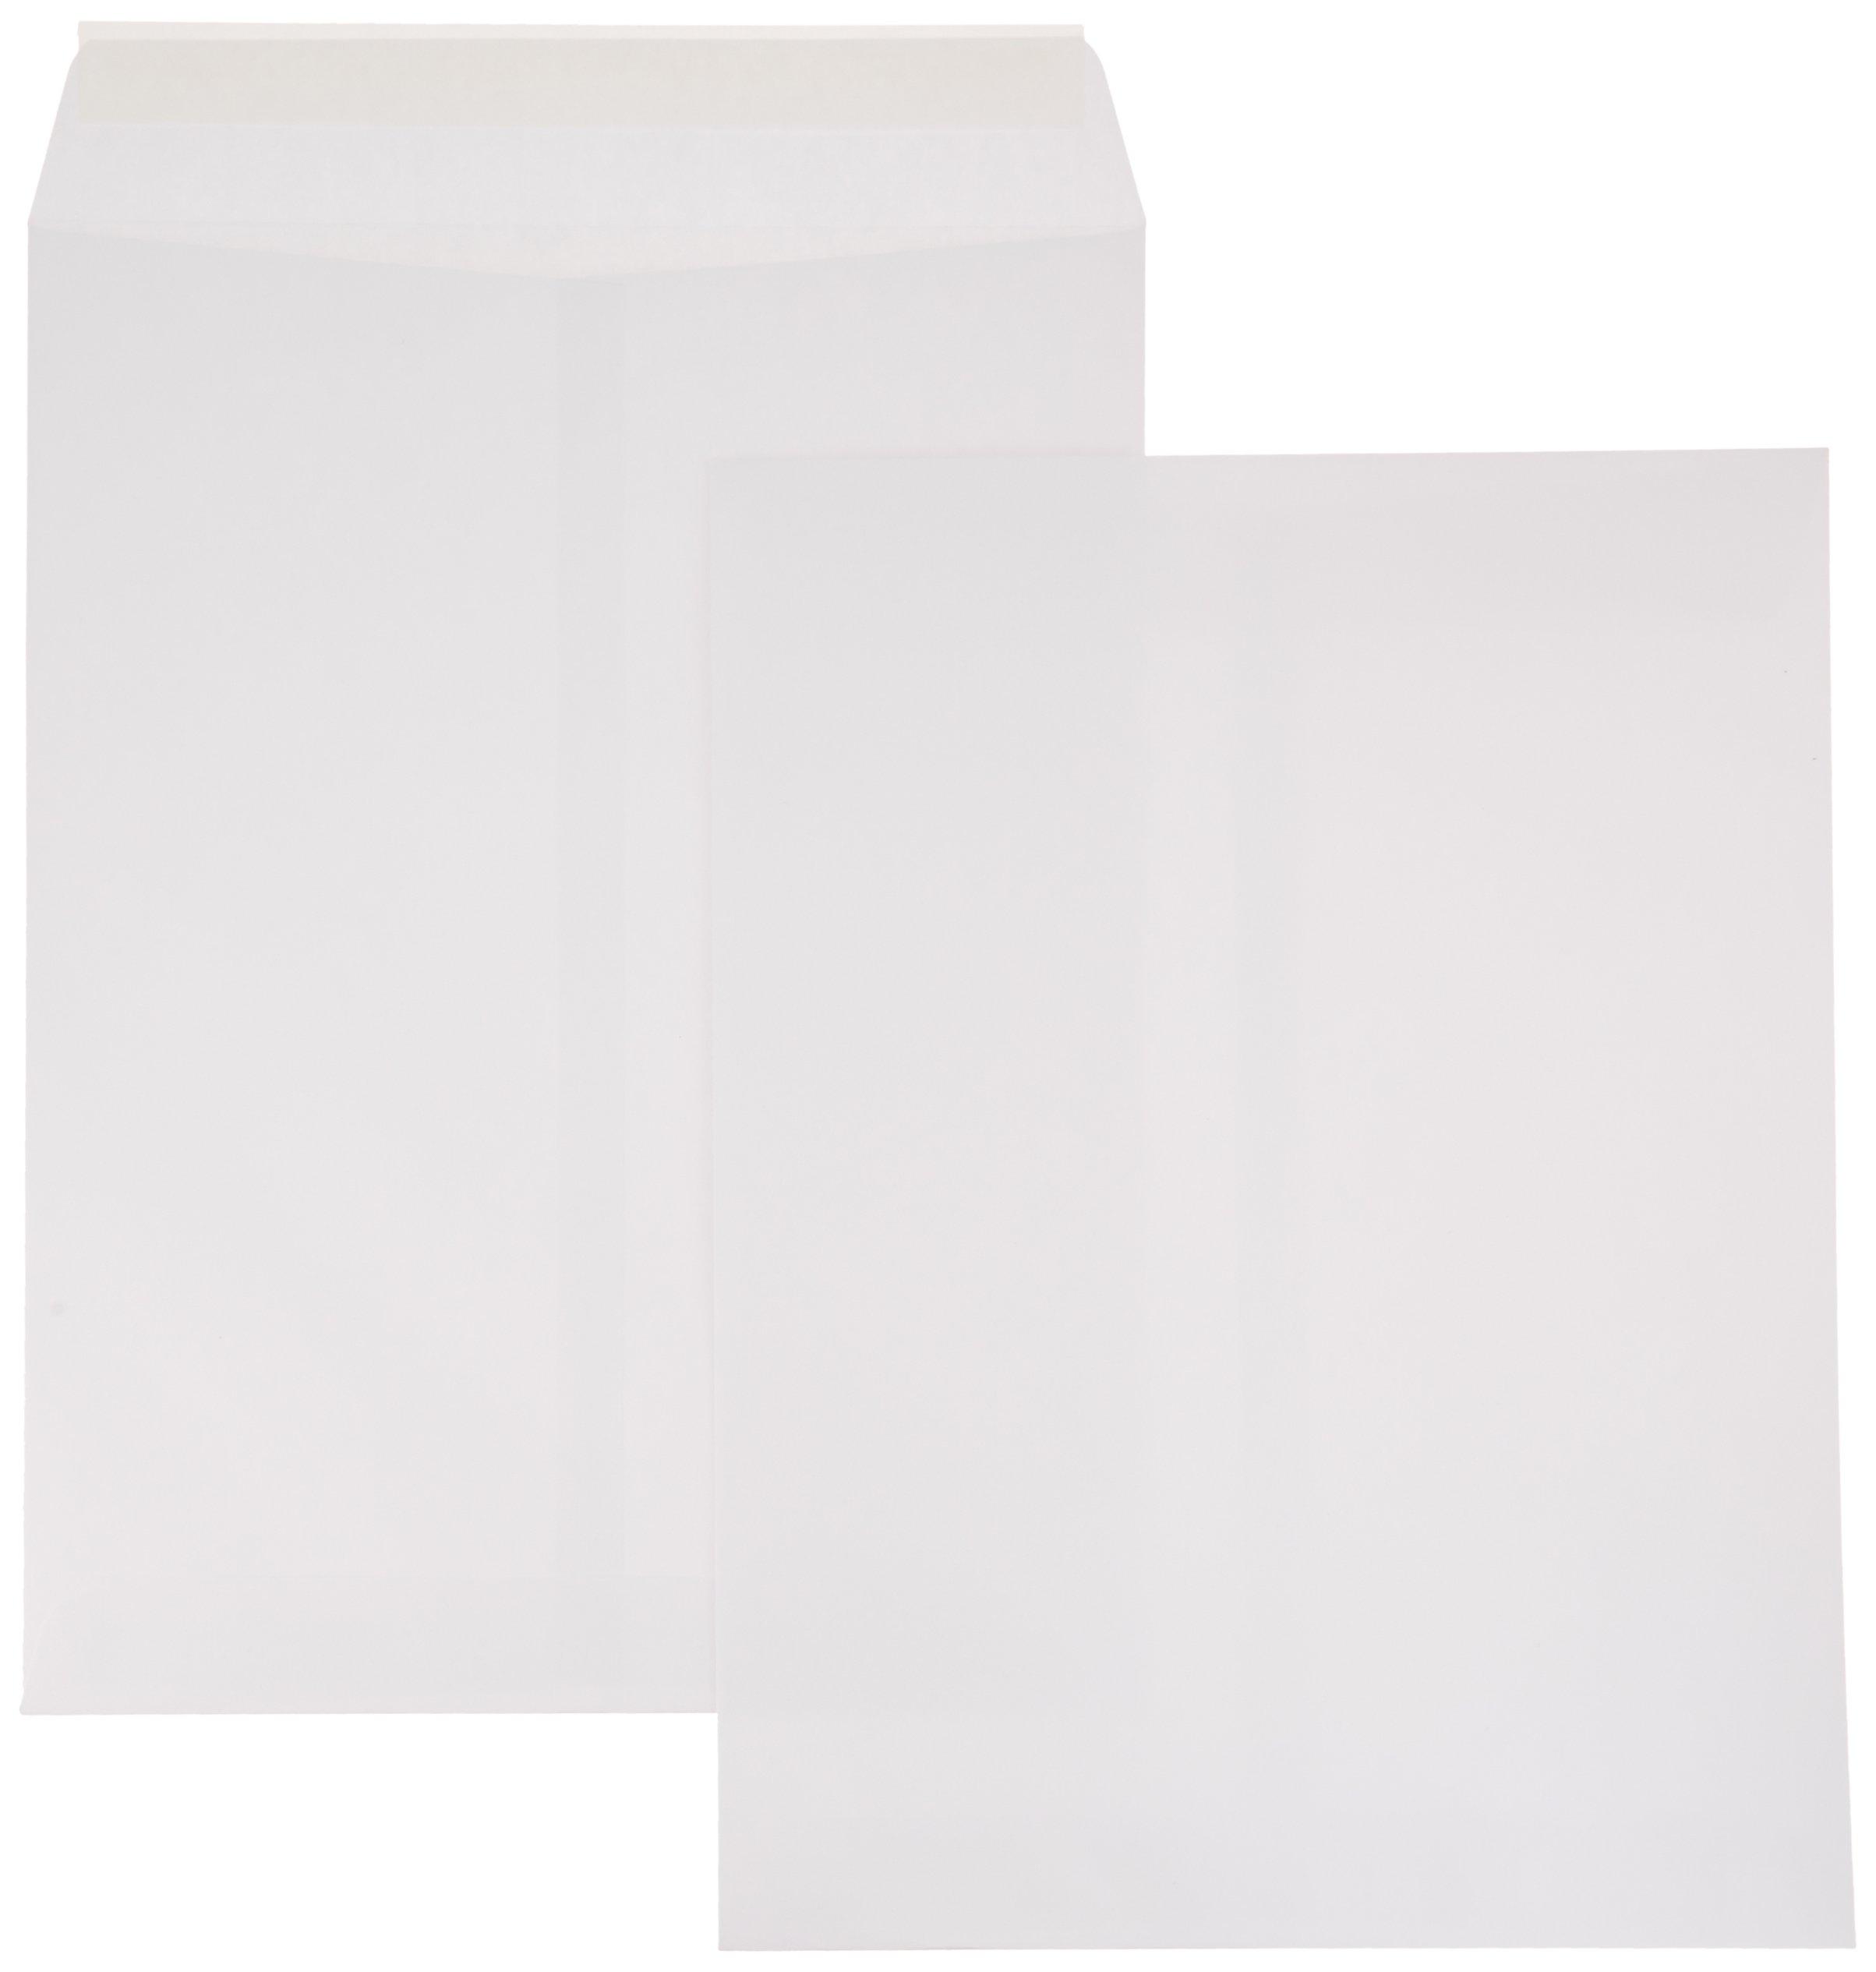 AmazonBasics Catalog Envelopes, Peel & Seal, 9 x 12 Inch, White, 100-Pack